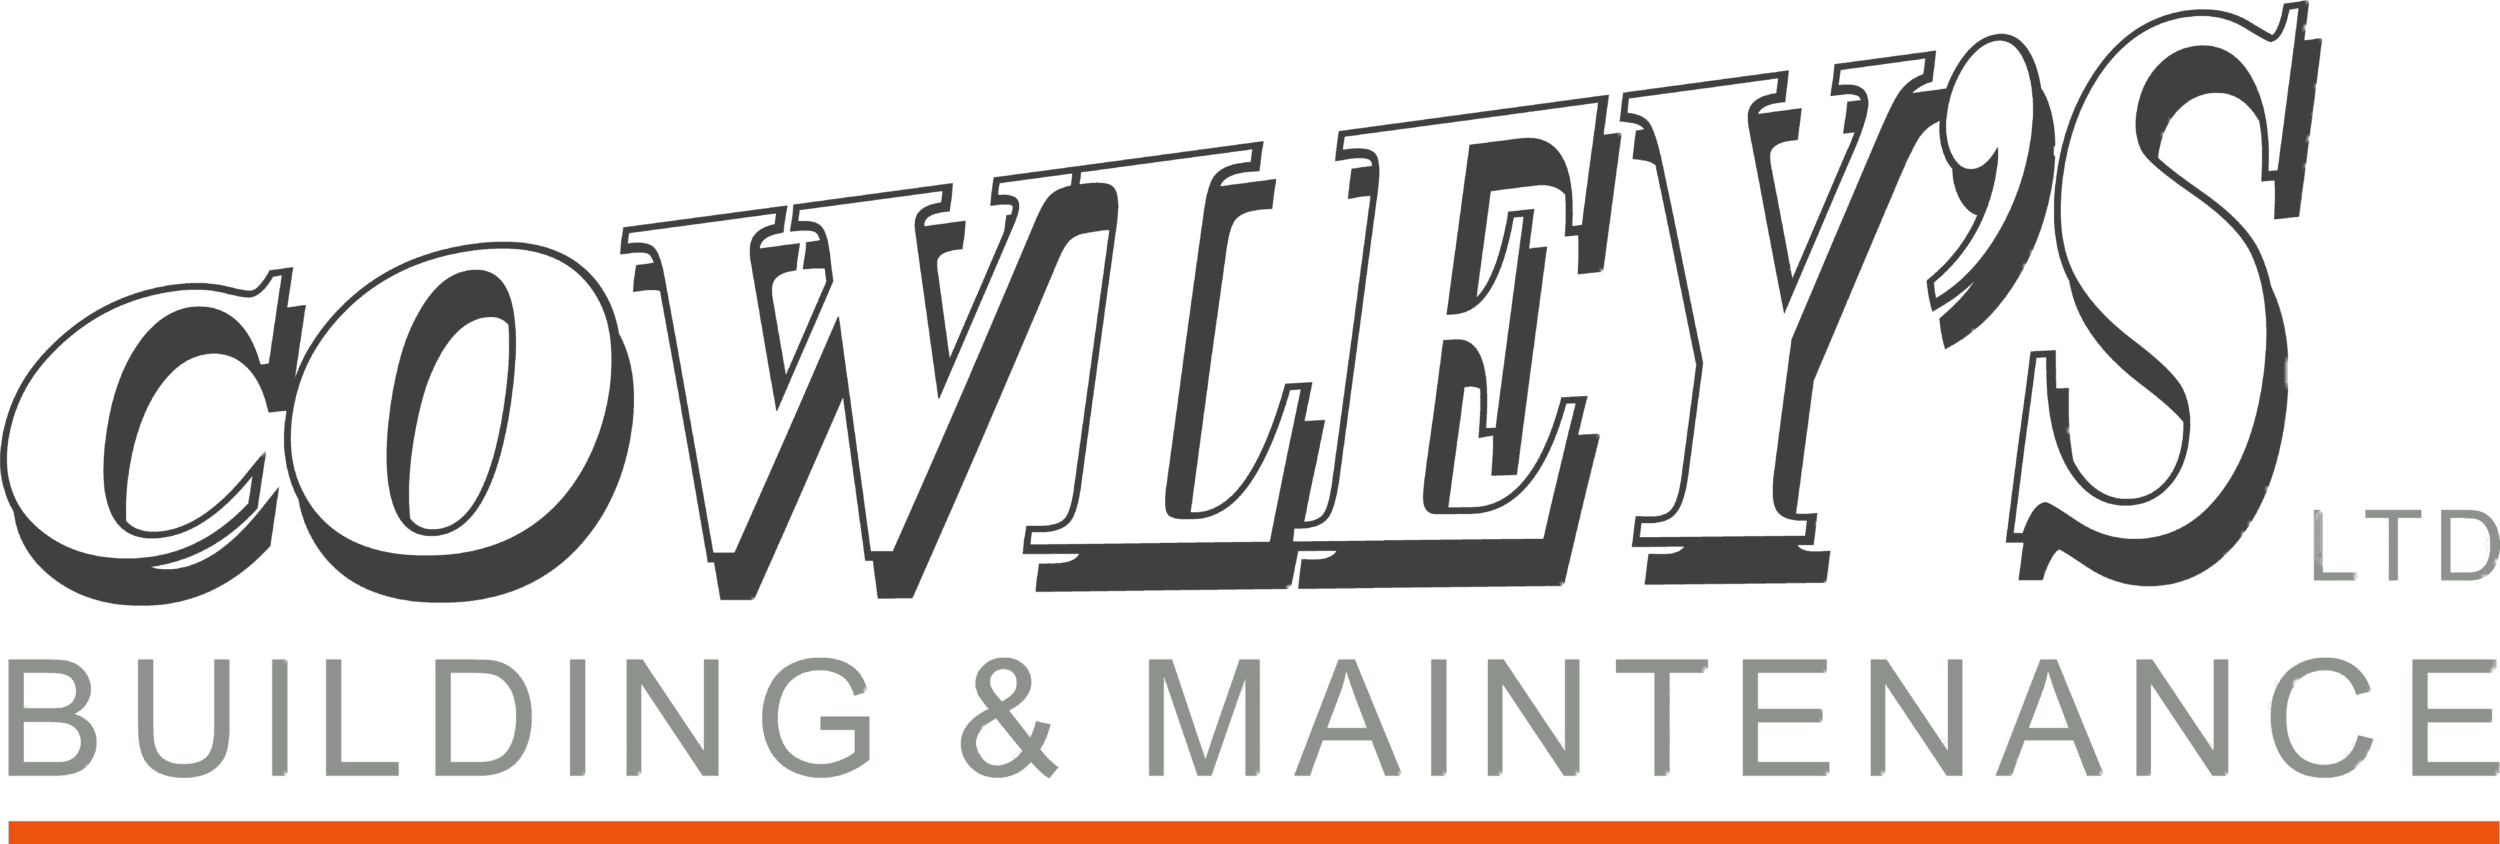 Cowleys White logo trans